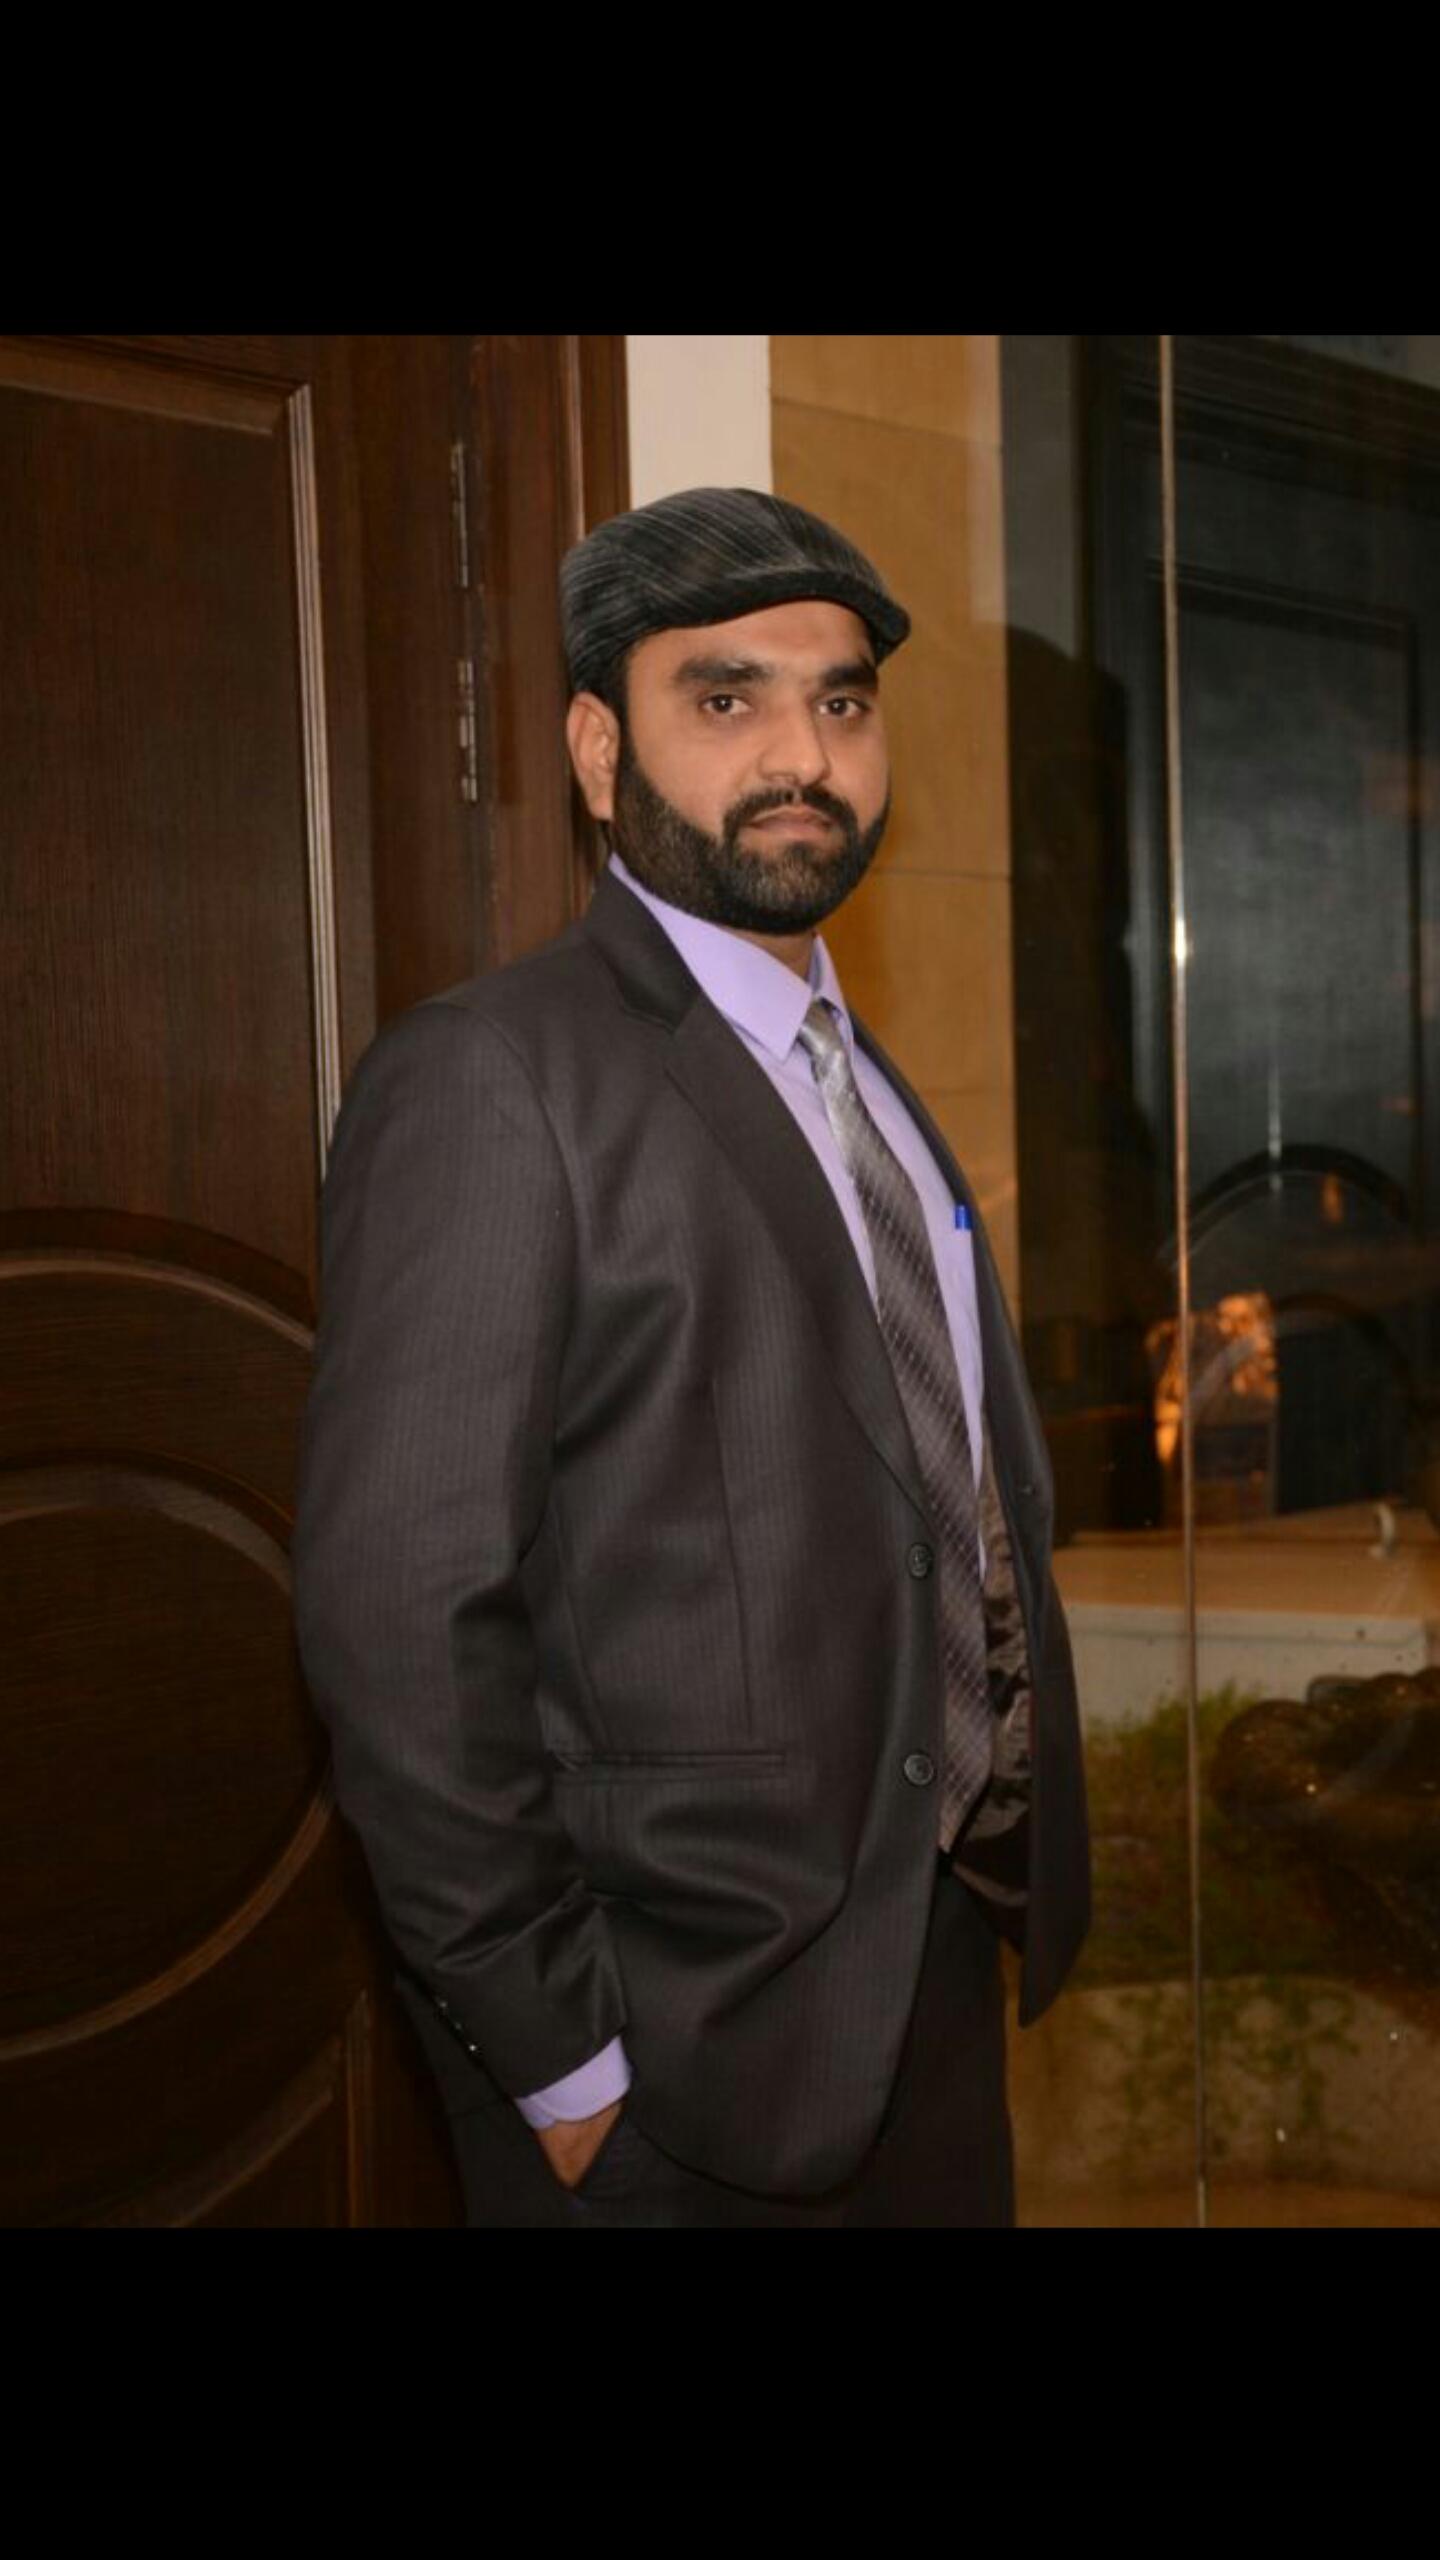 Profile picture of Raja26